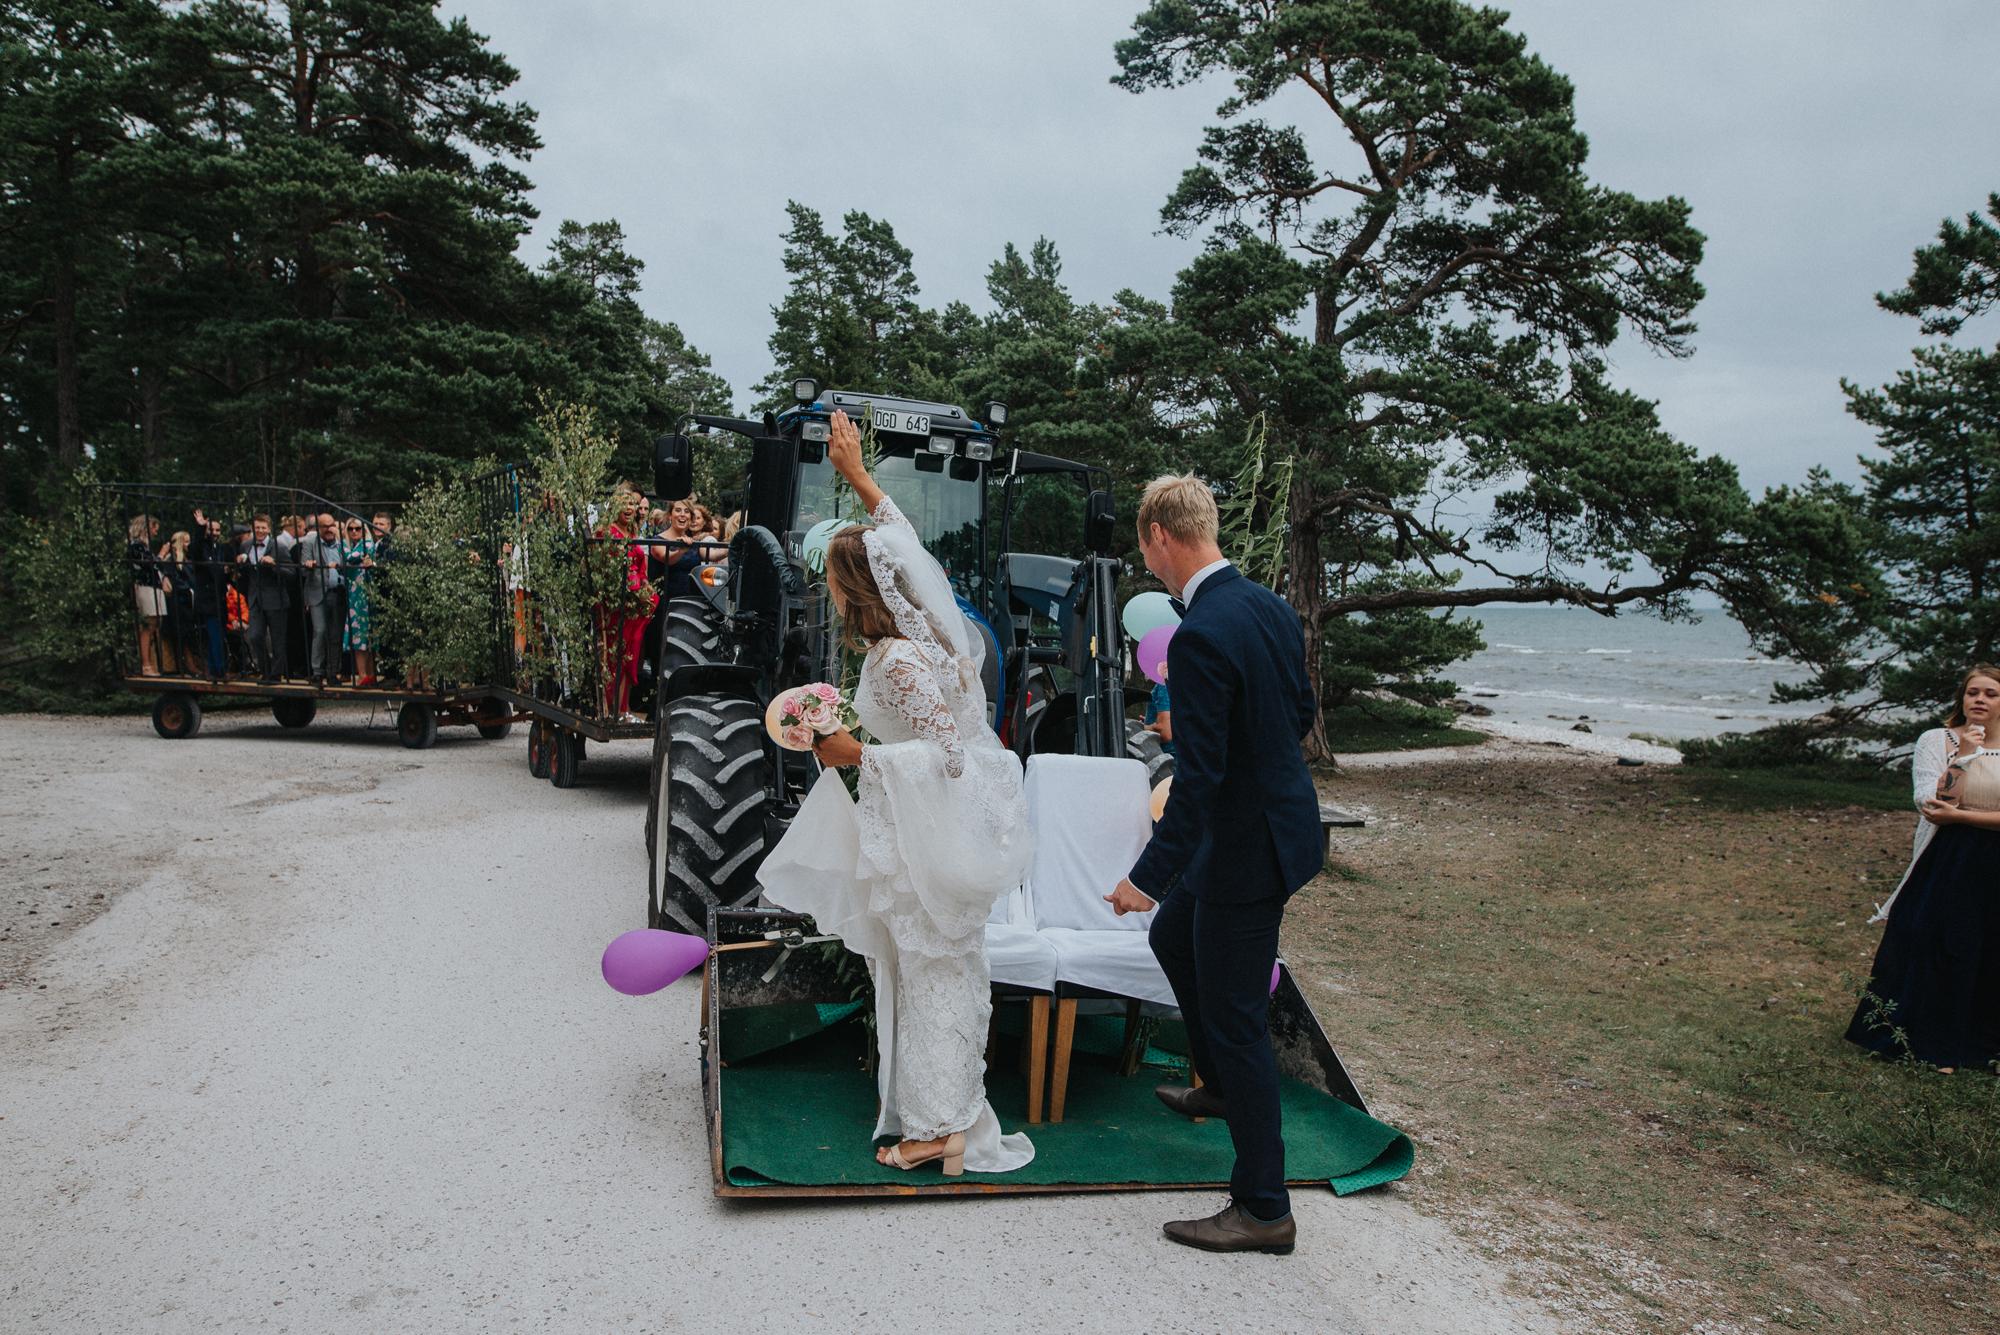 047-bröllopsfotograf-folhammar-gotland-neas-fotografi.jpg